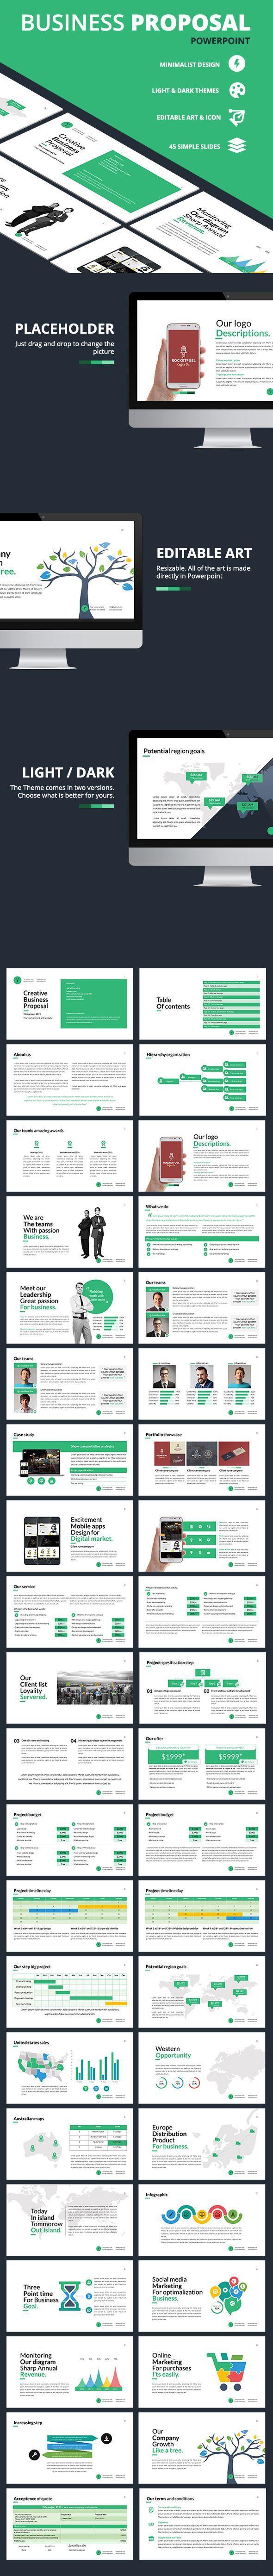 business proposal presentation template inspirationa new free plan p